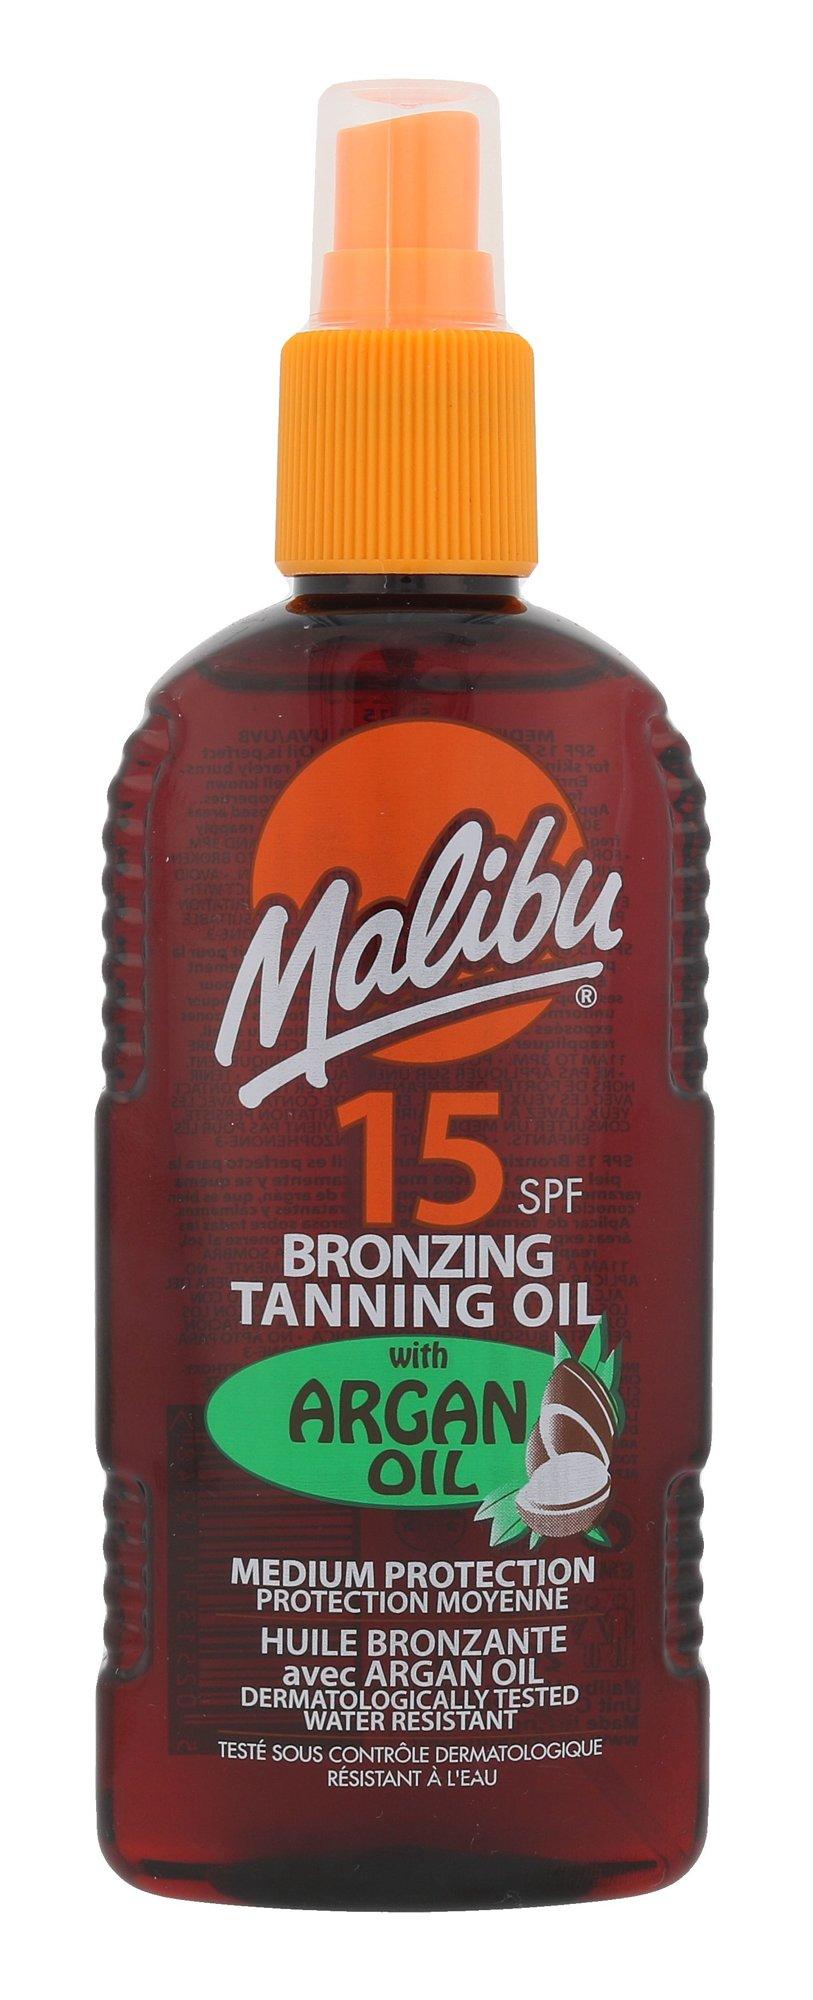 Malibu Bronzing Tanning Oil Cosmetic 200ml